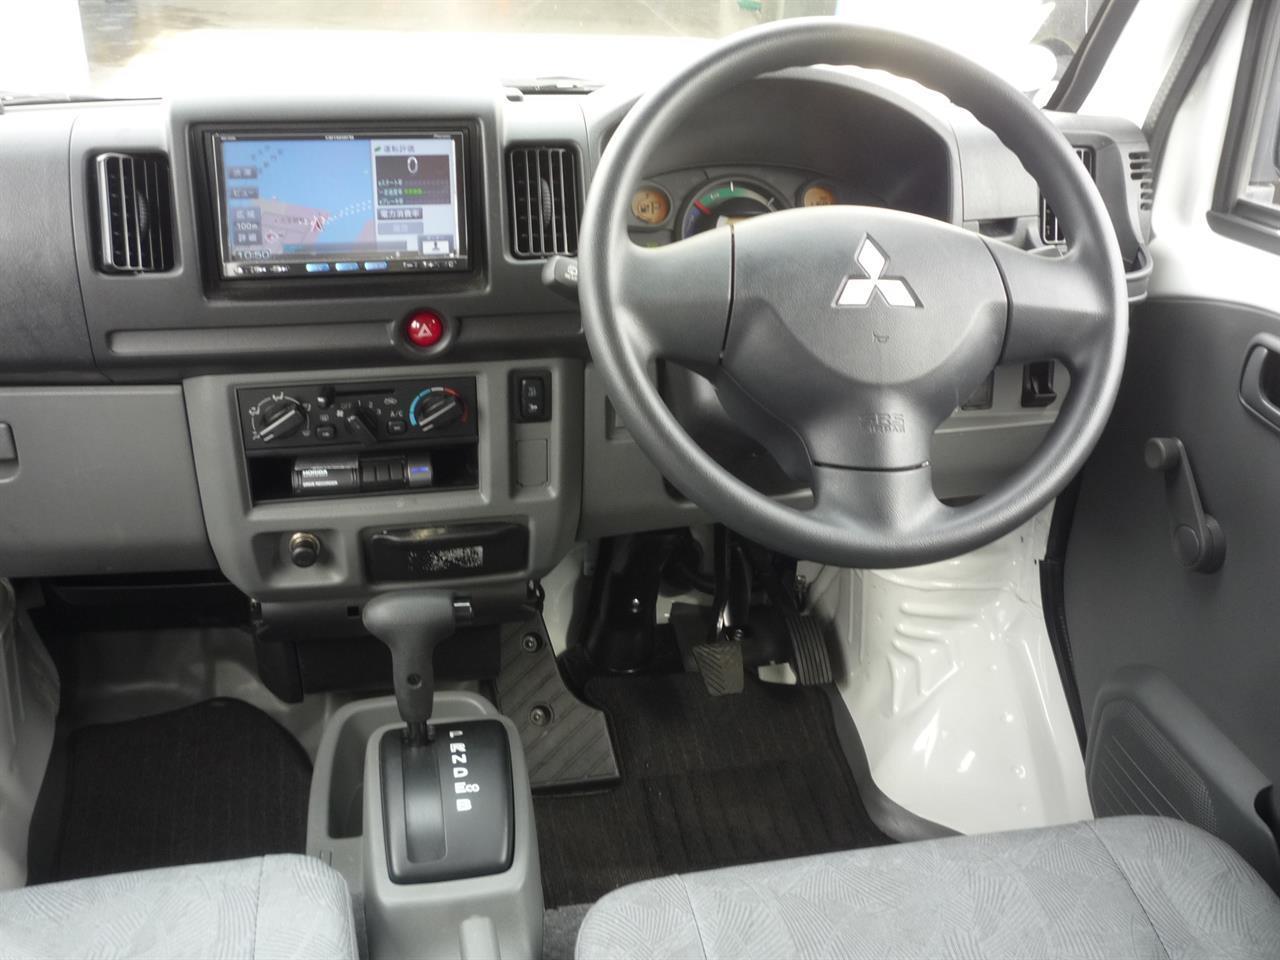 image-2, 2013 Mitsubishi MiniCab MiEV Electric Van at Dunedin